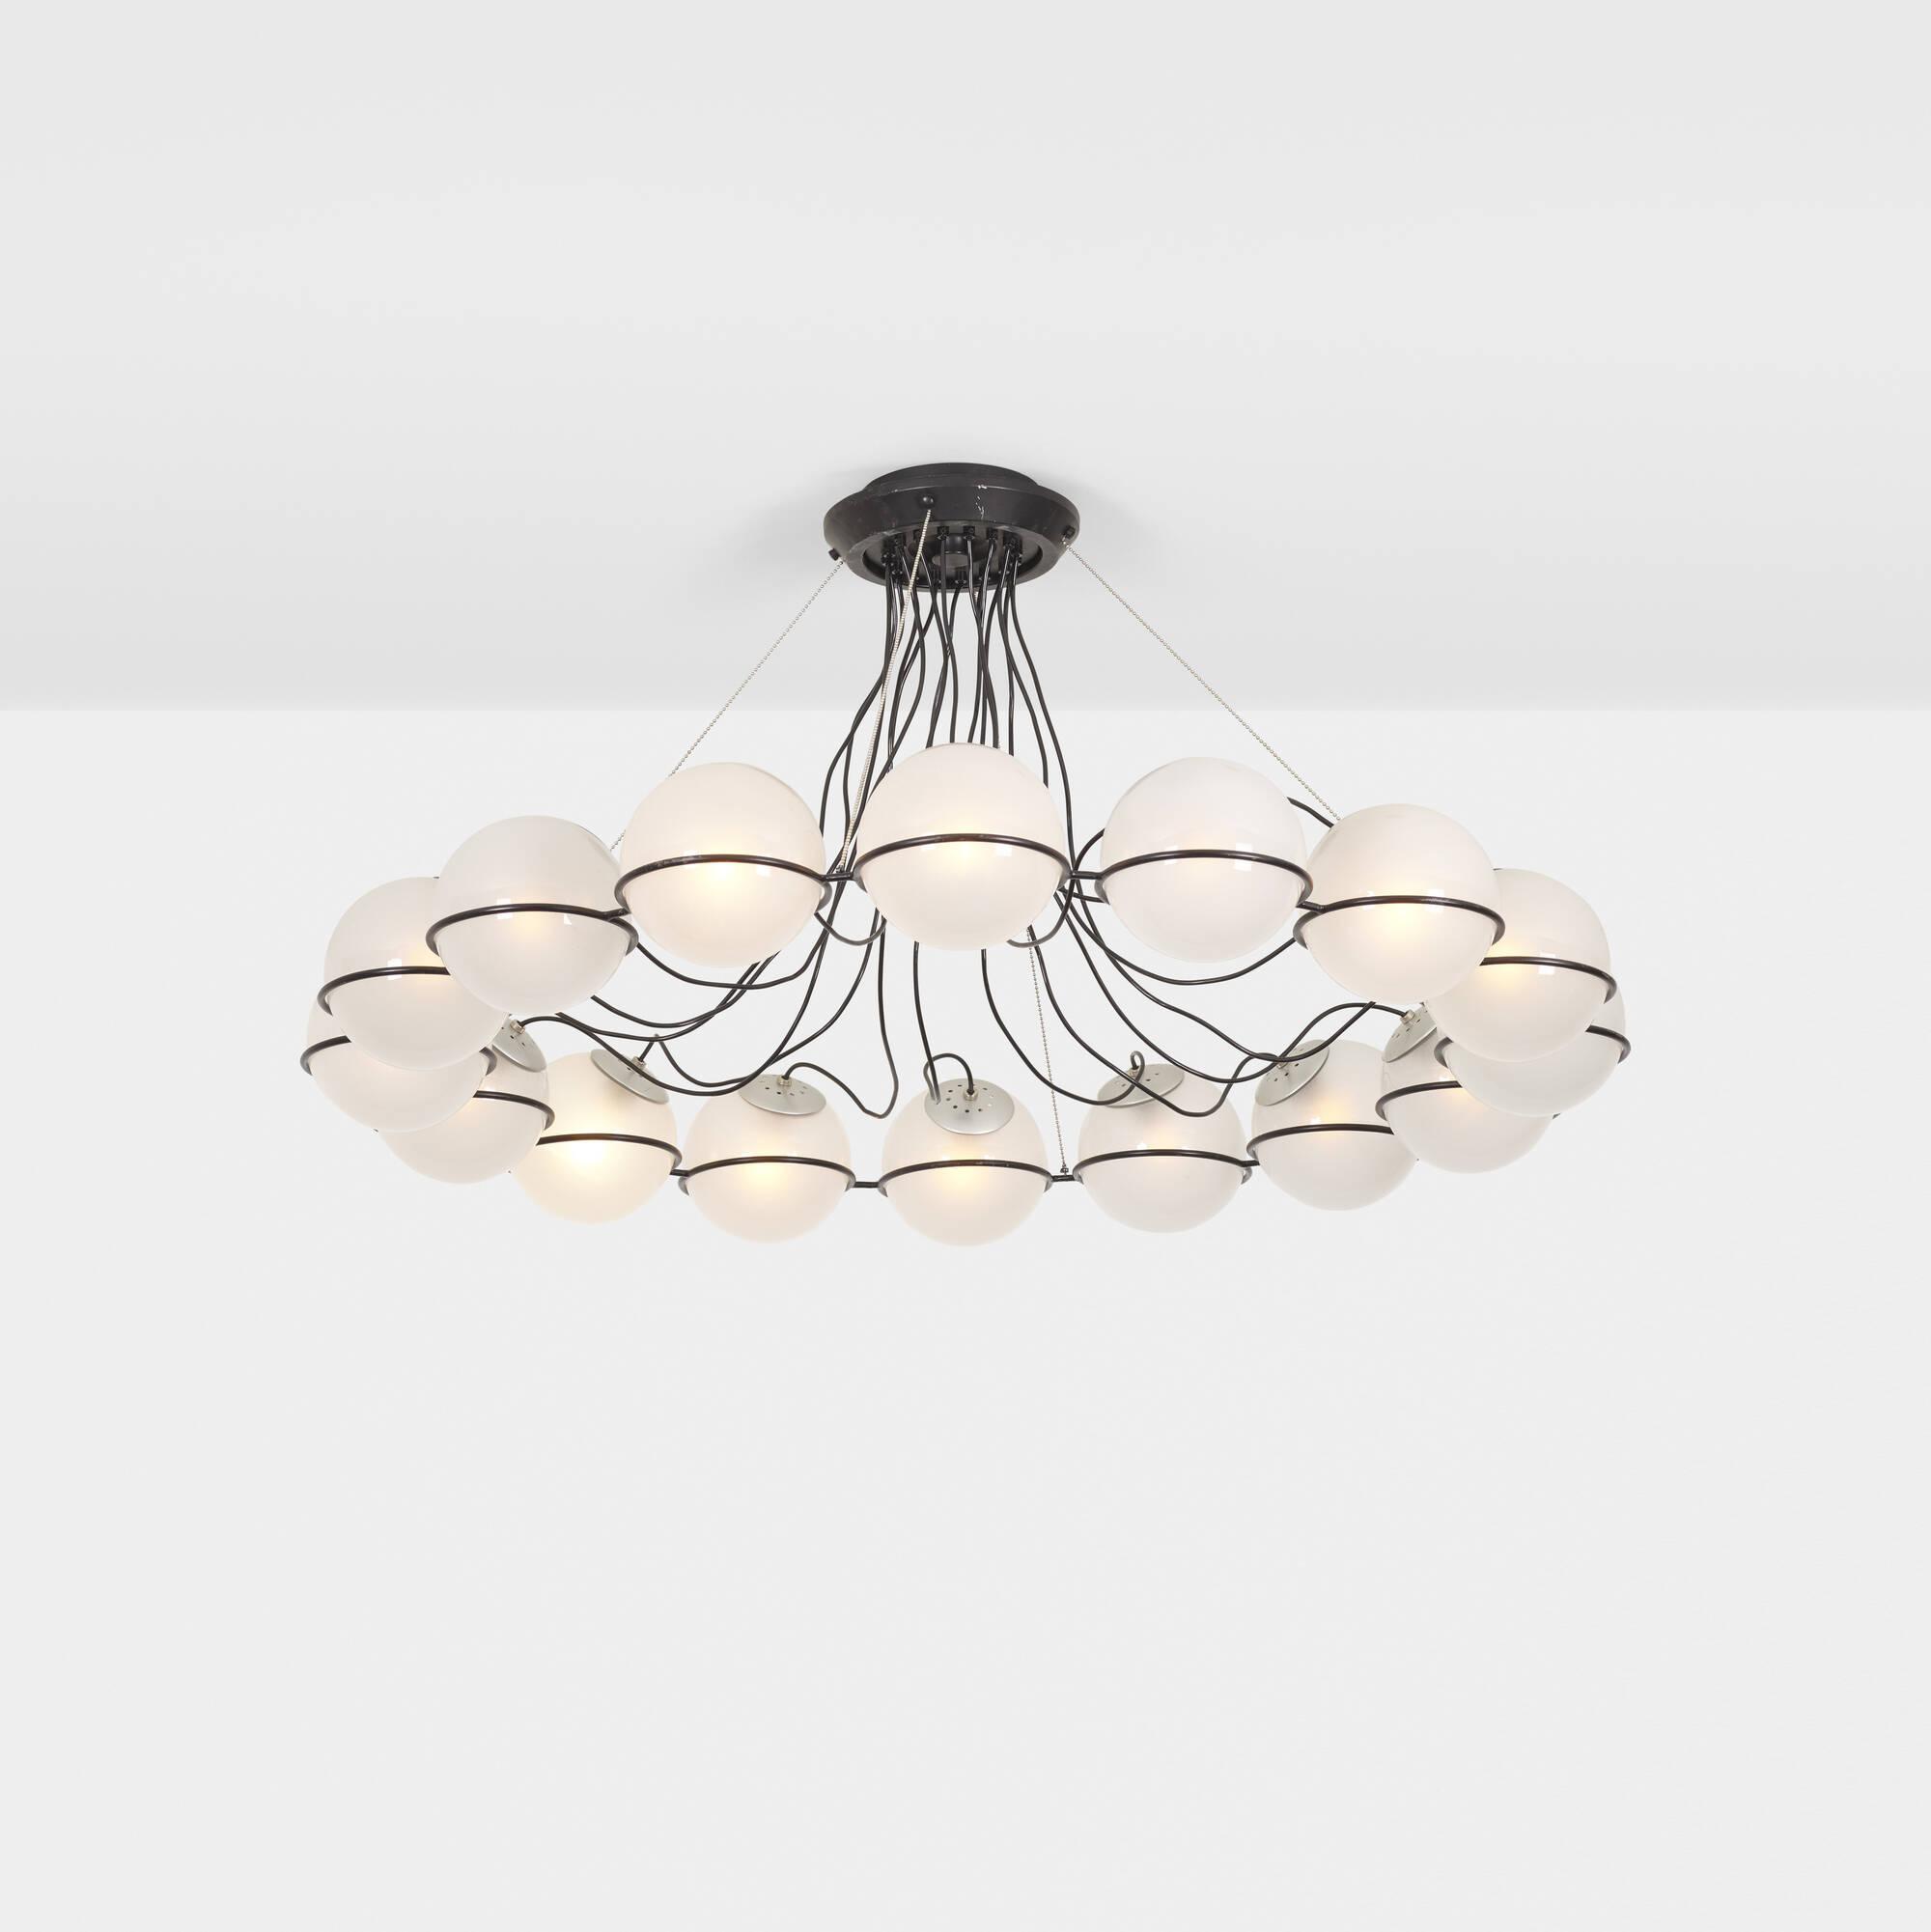 196: Gino Sarfatti / chandelier, model 2109/16 (1 of 1)